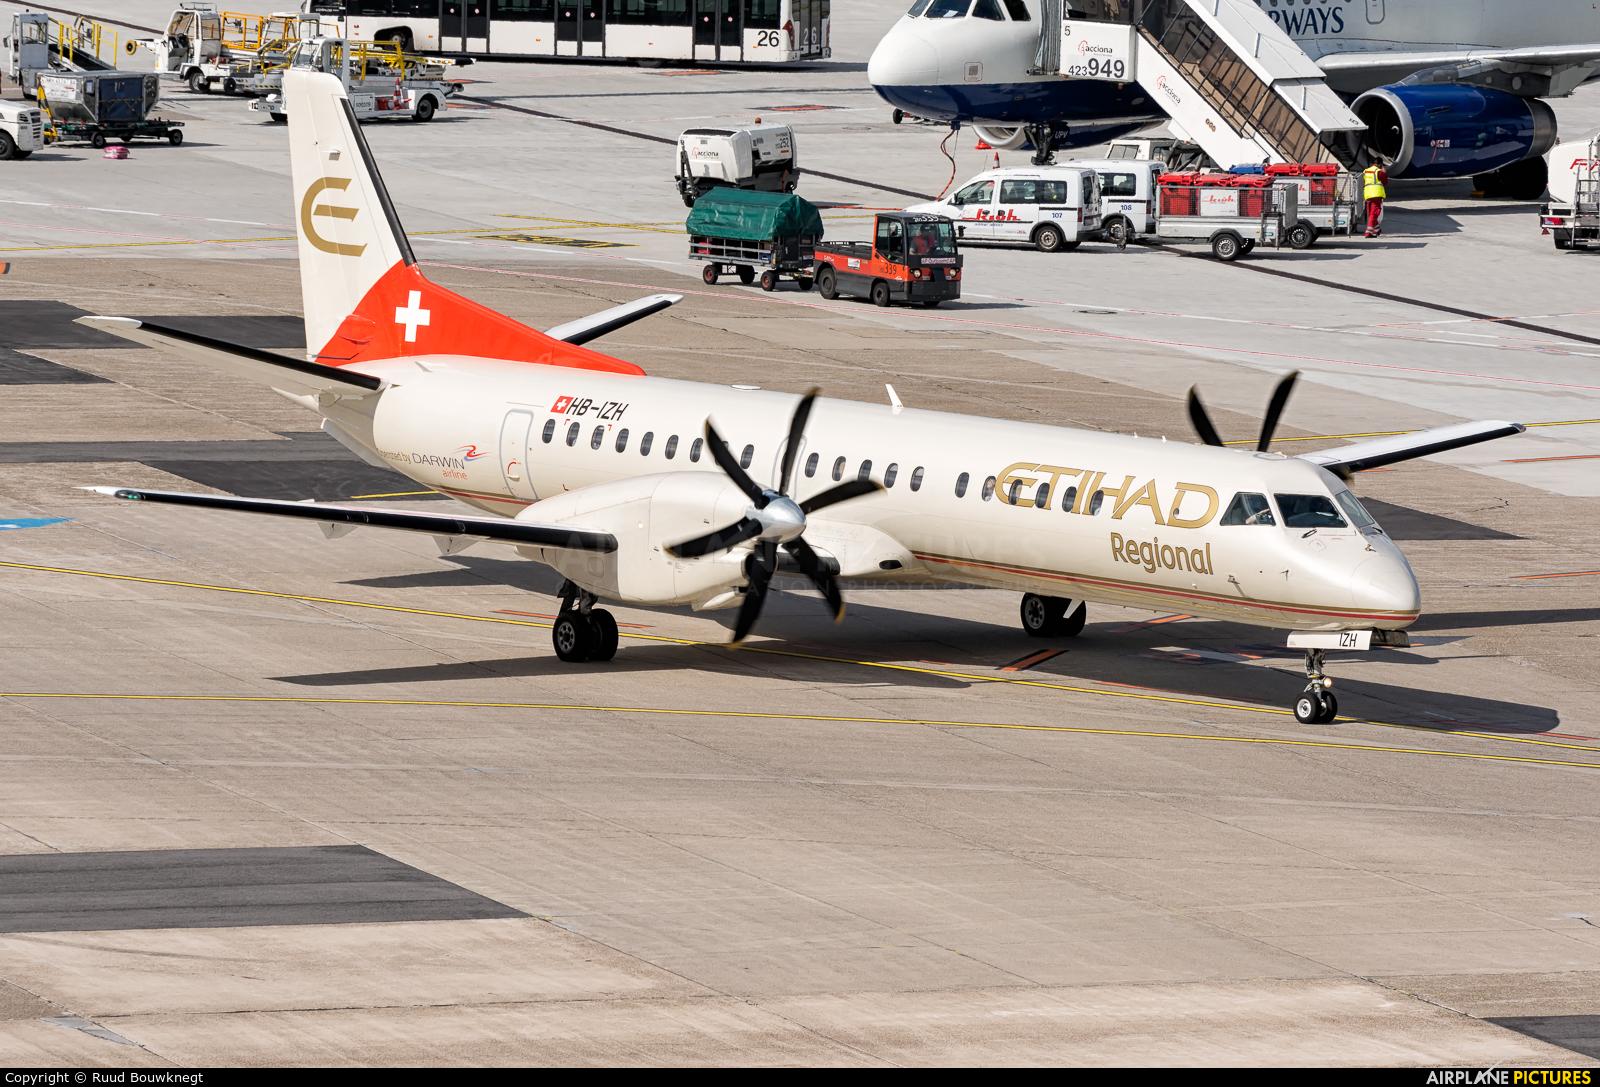 Etihad Regional - Darwin Airlines HB-IZH aircraft at Düsseldorf